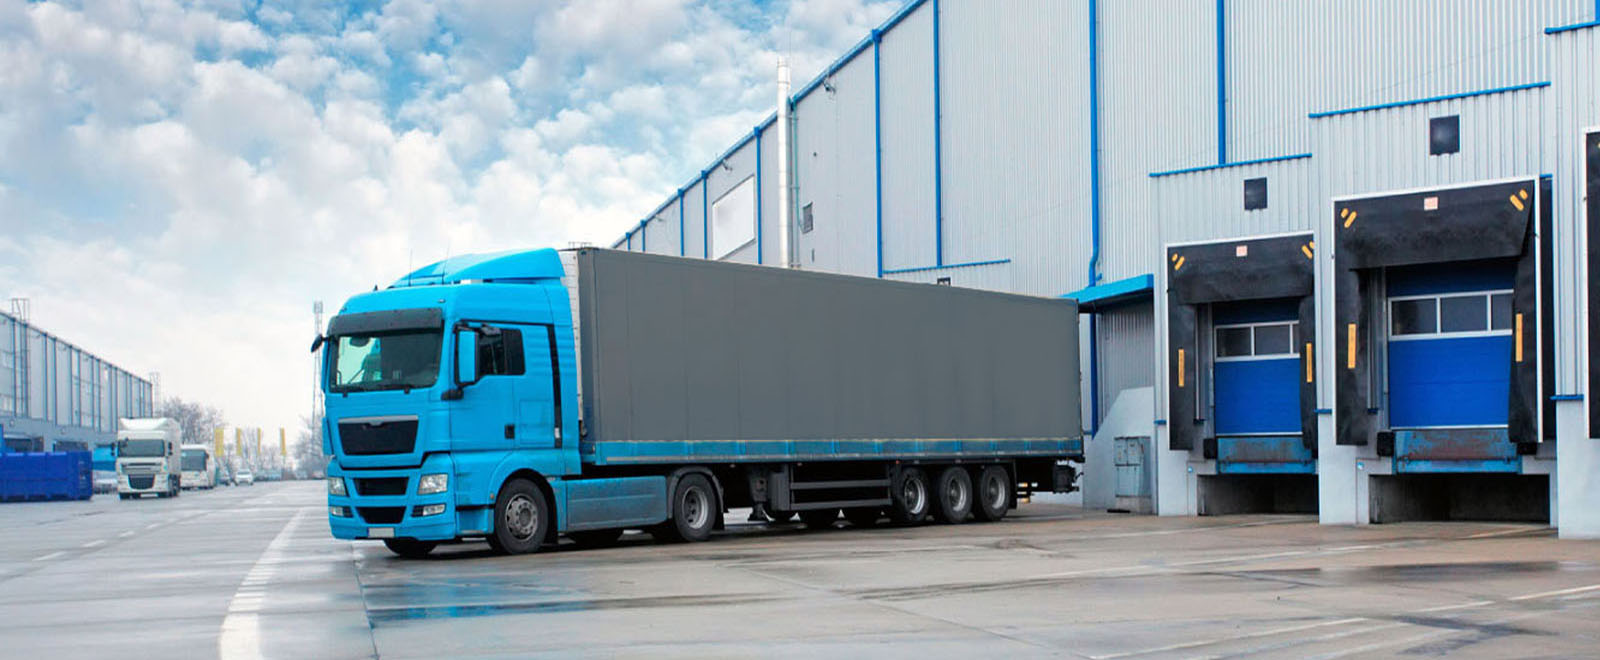 df9bf58f4a94b Транспортная компания - доставка грузов по Екатеринбургу, Тюмени, Москве,  Санкт-Петербурге, ХМАО и ЯНАО   Грузлайн